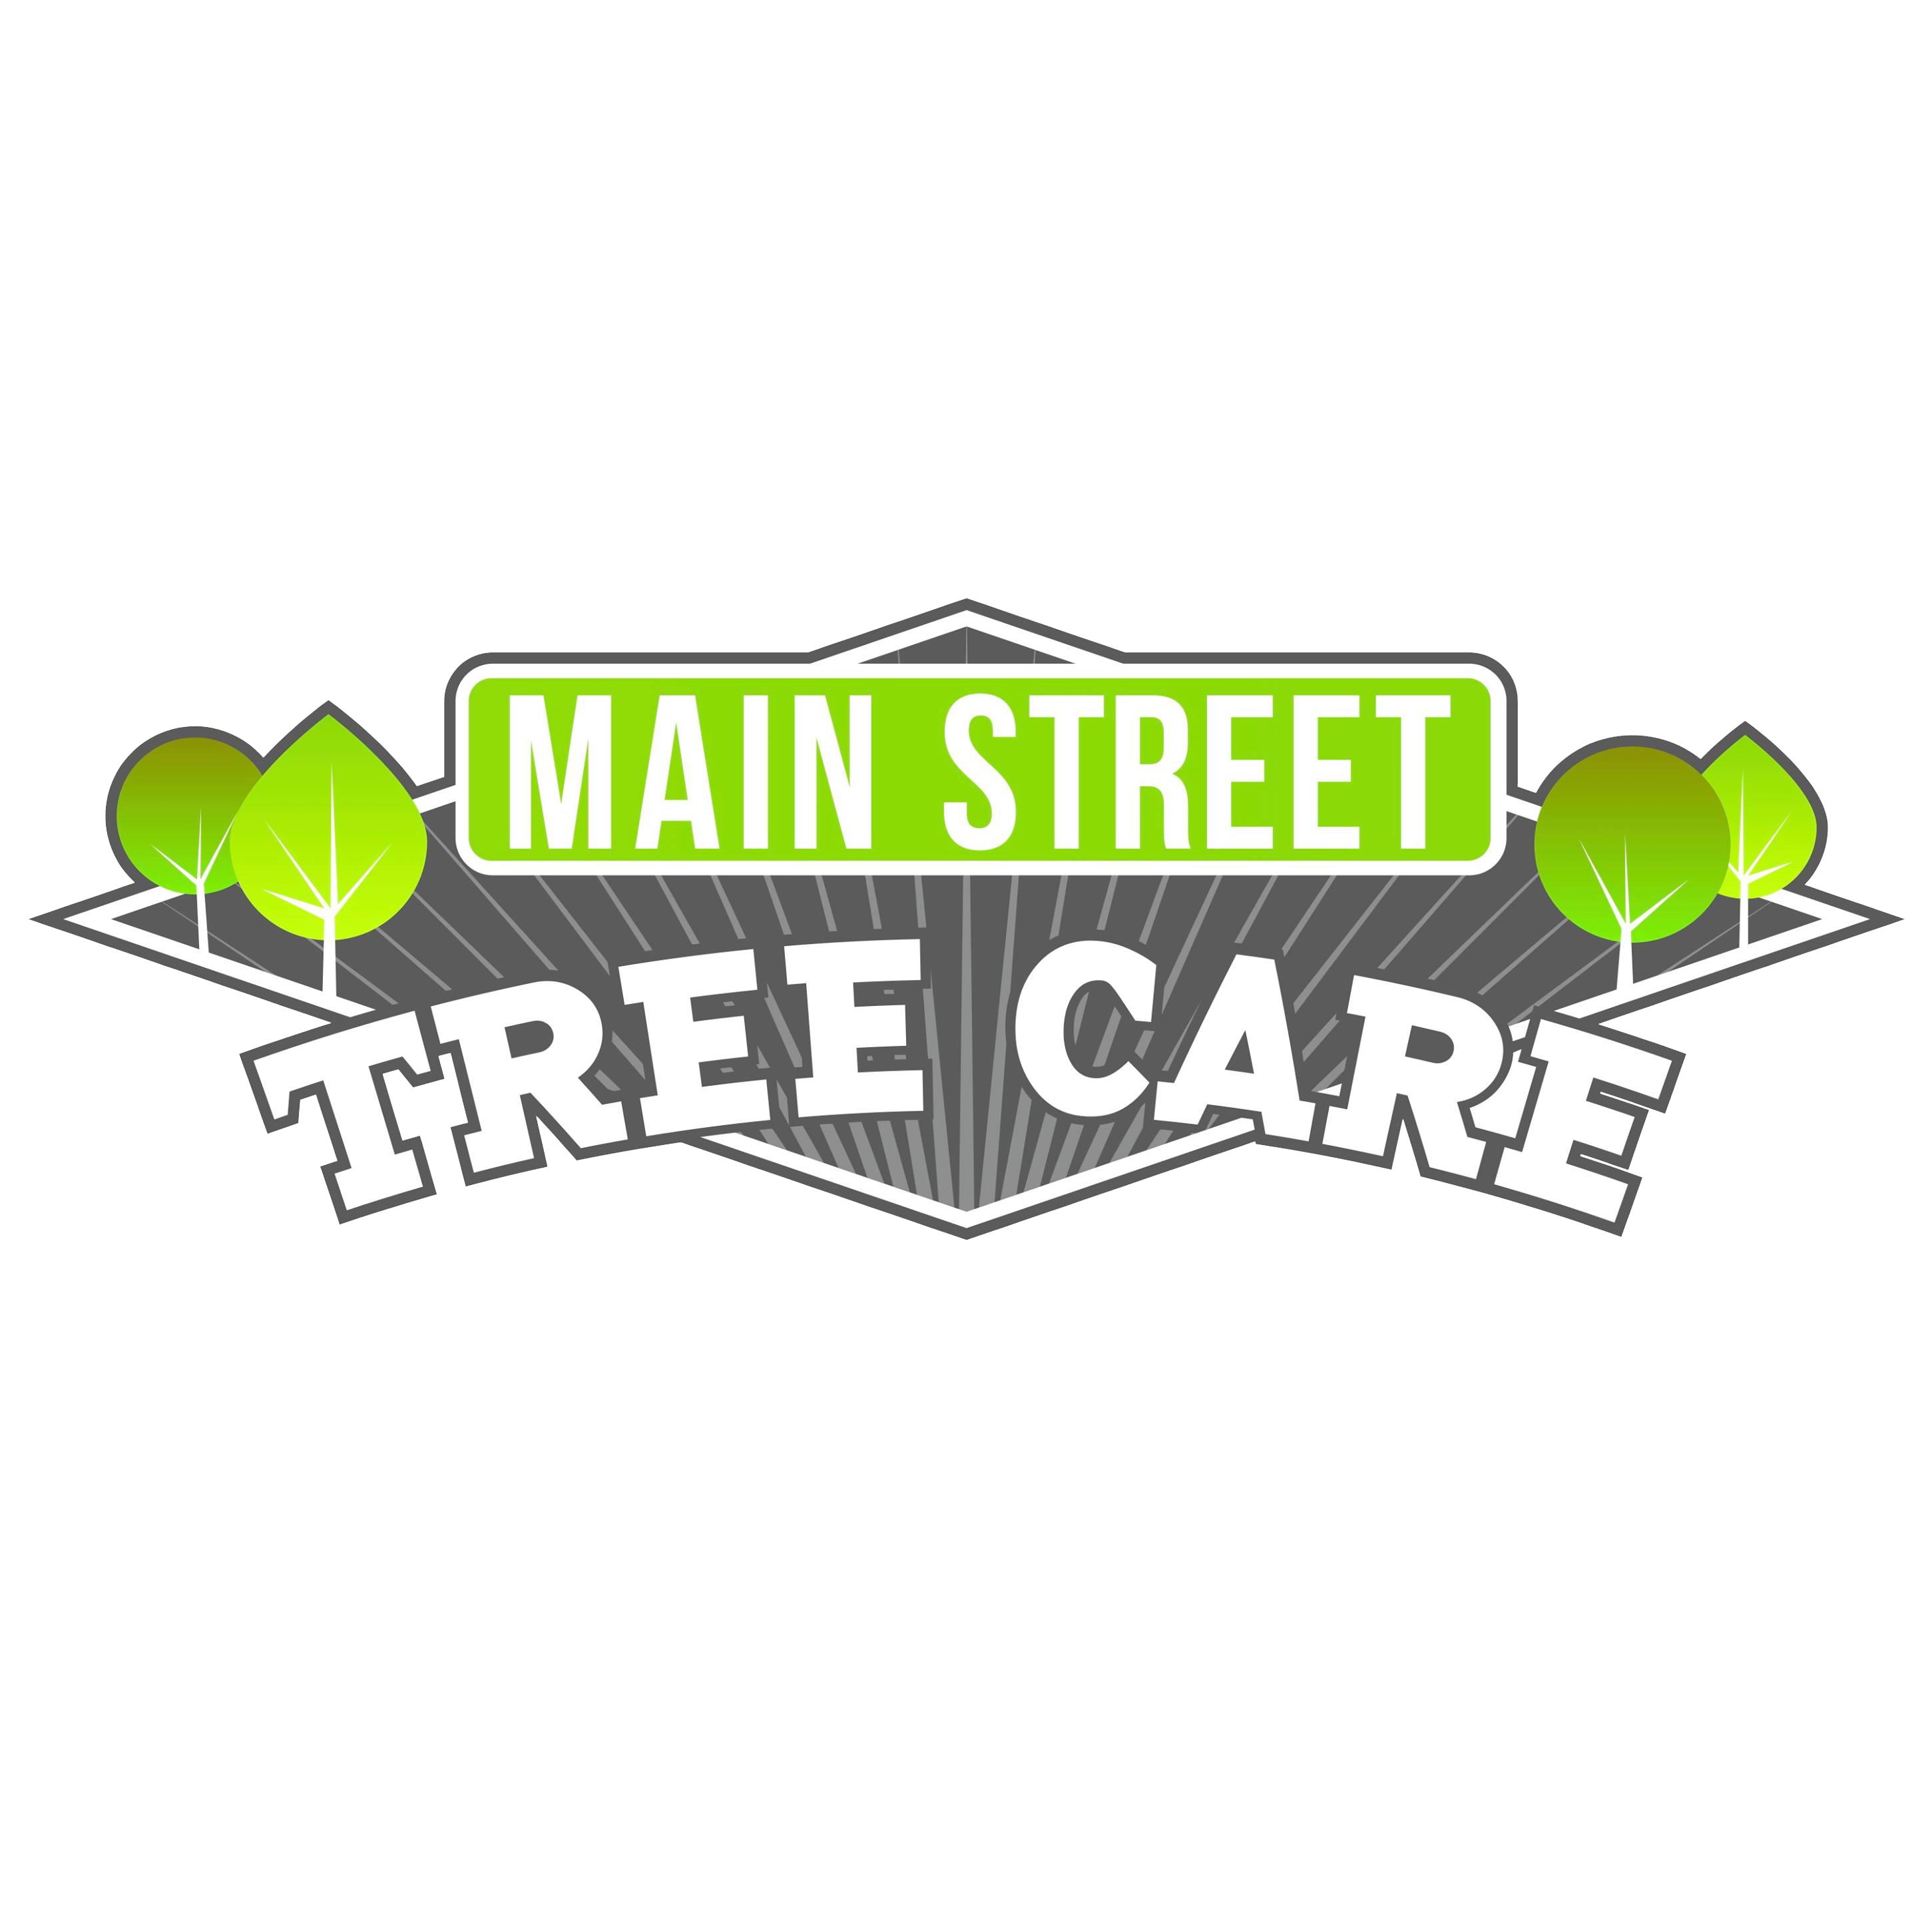 Main Street Tree Care